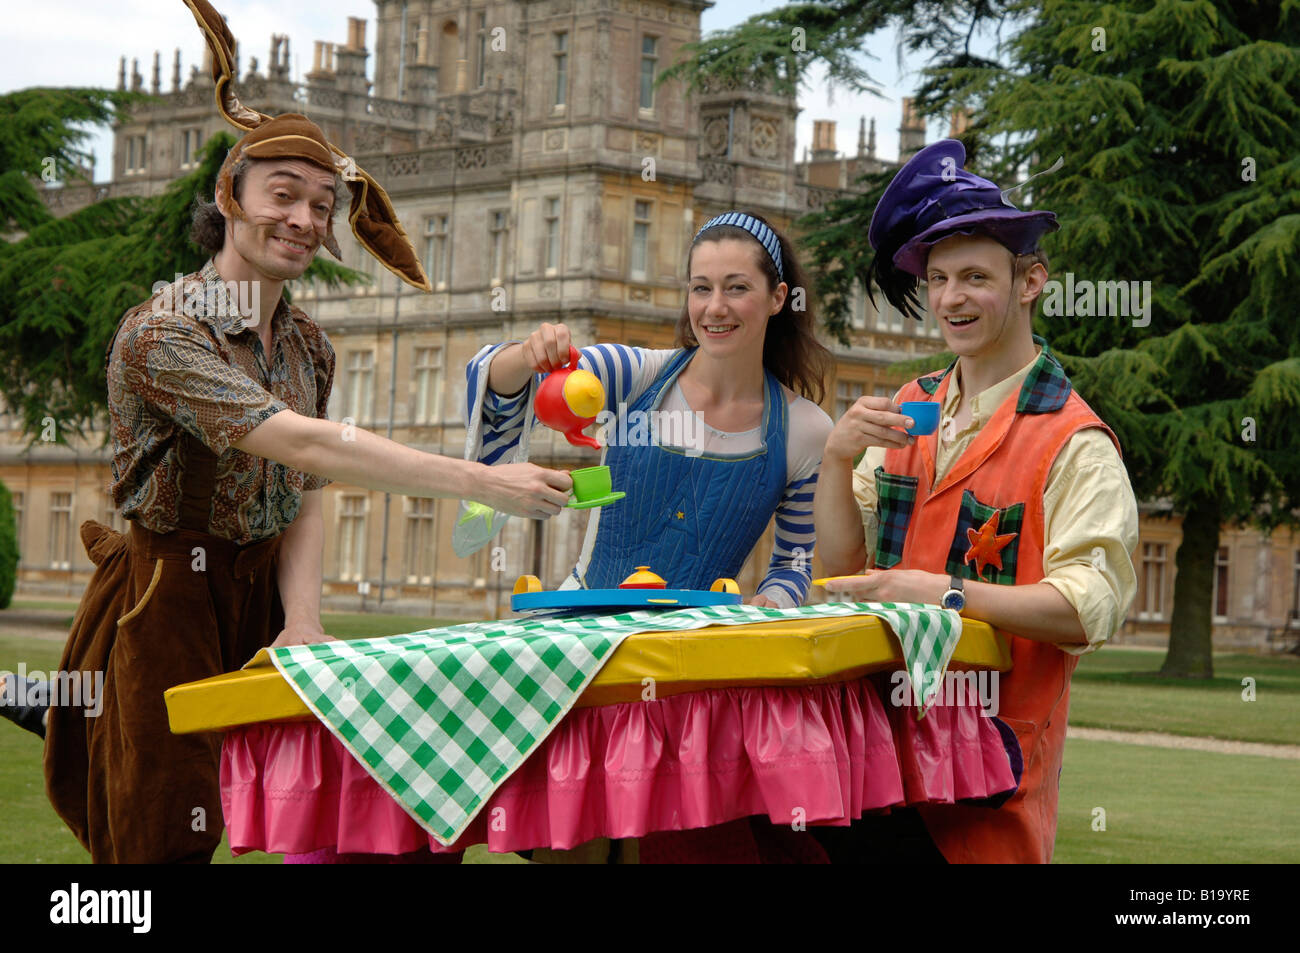 Alice in Wonderland tea party - Stock Image